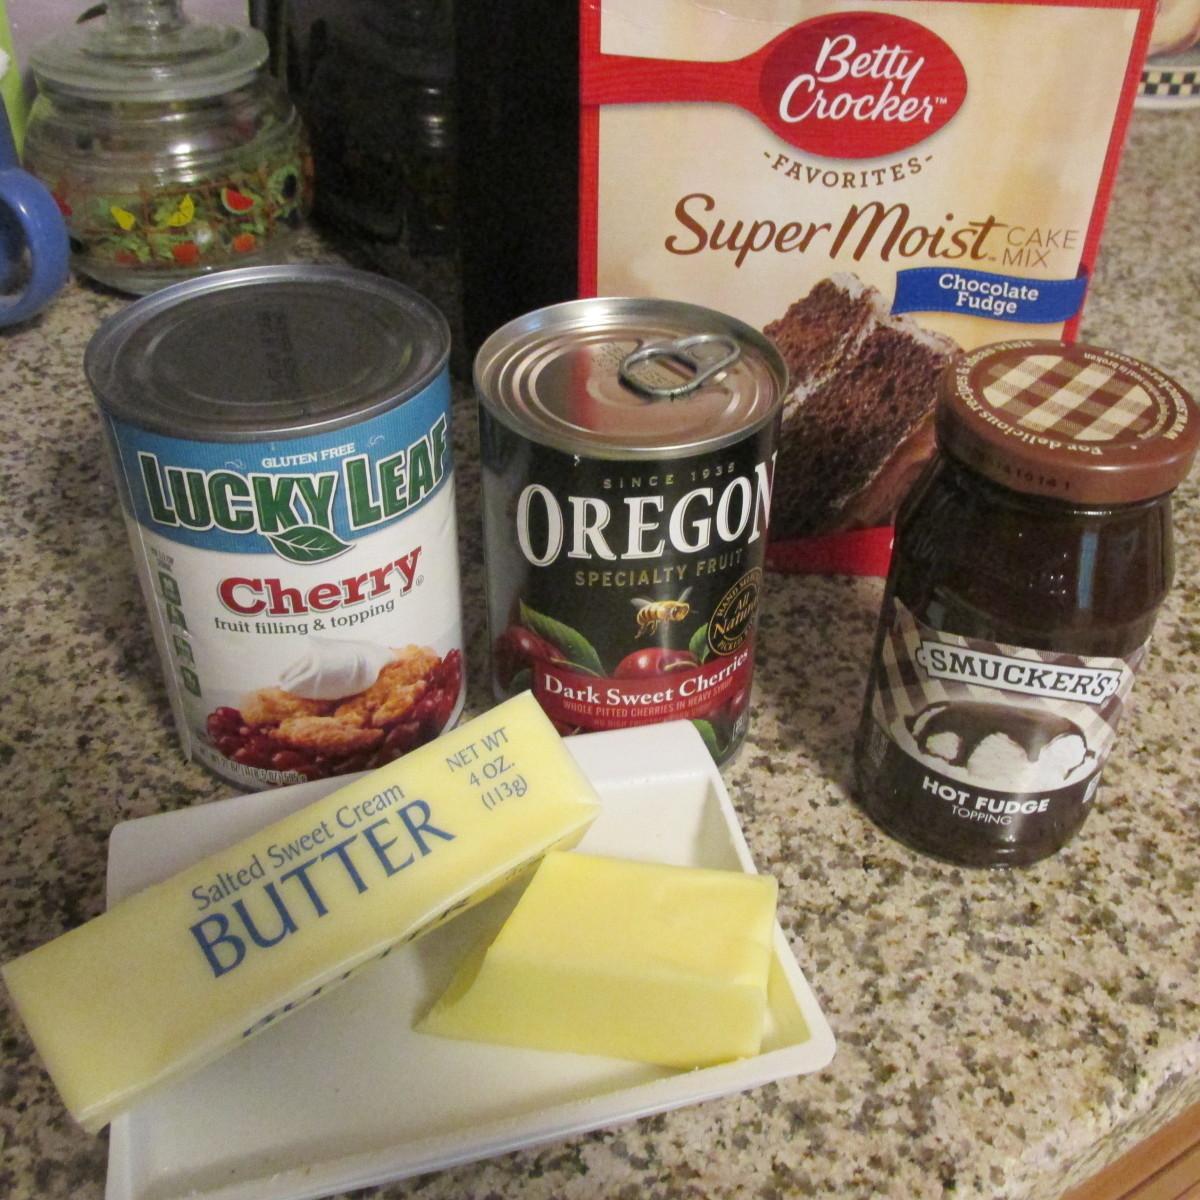 The ingredients.